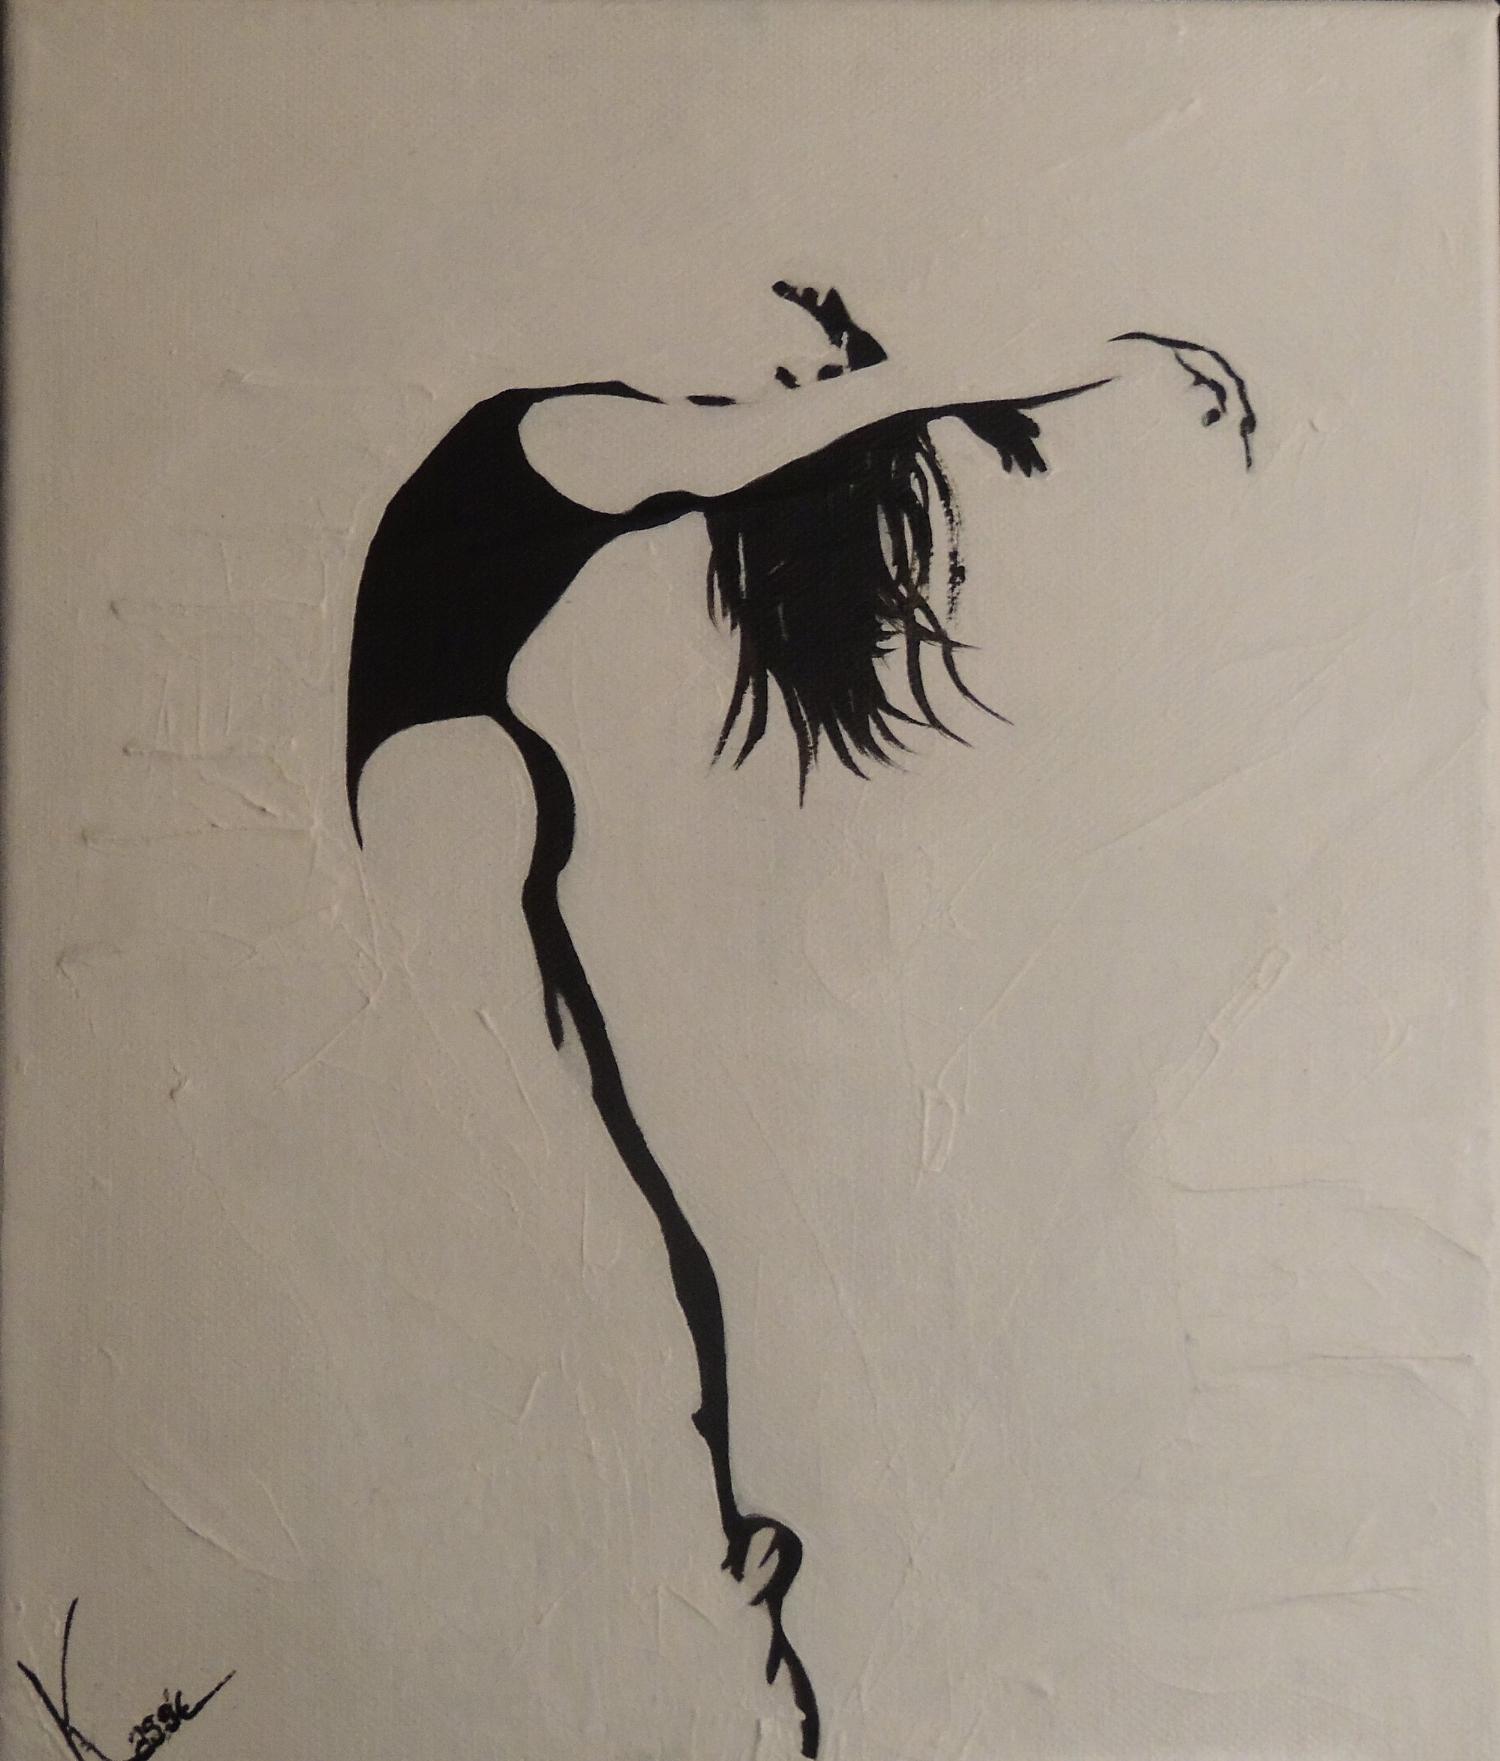 bailas-,óleo sobre tela, 30 x 25 cms.jpg